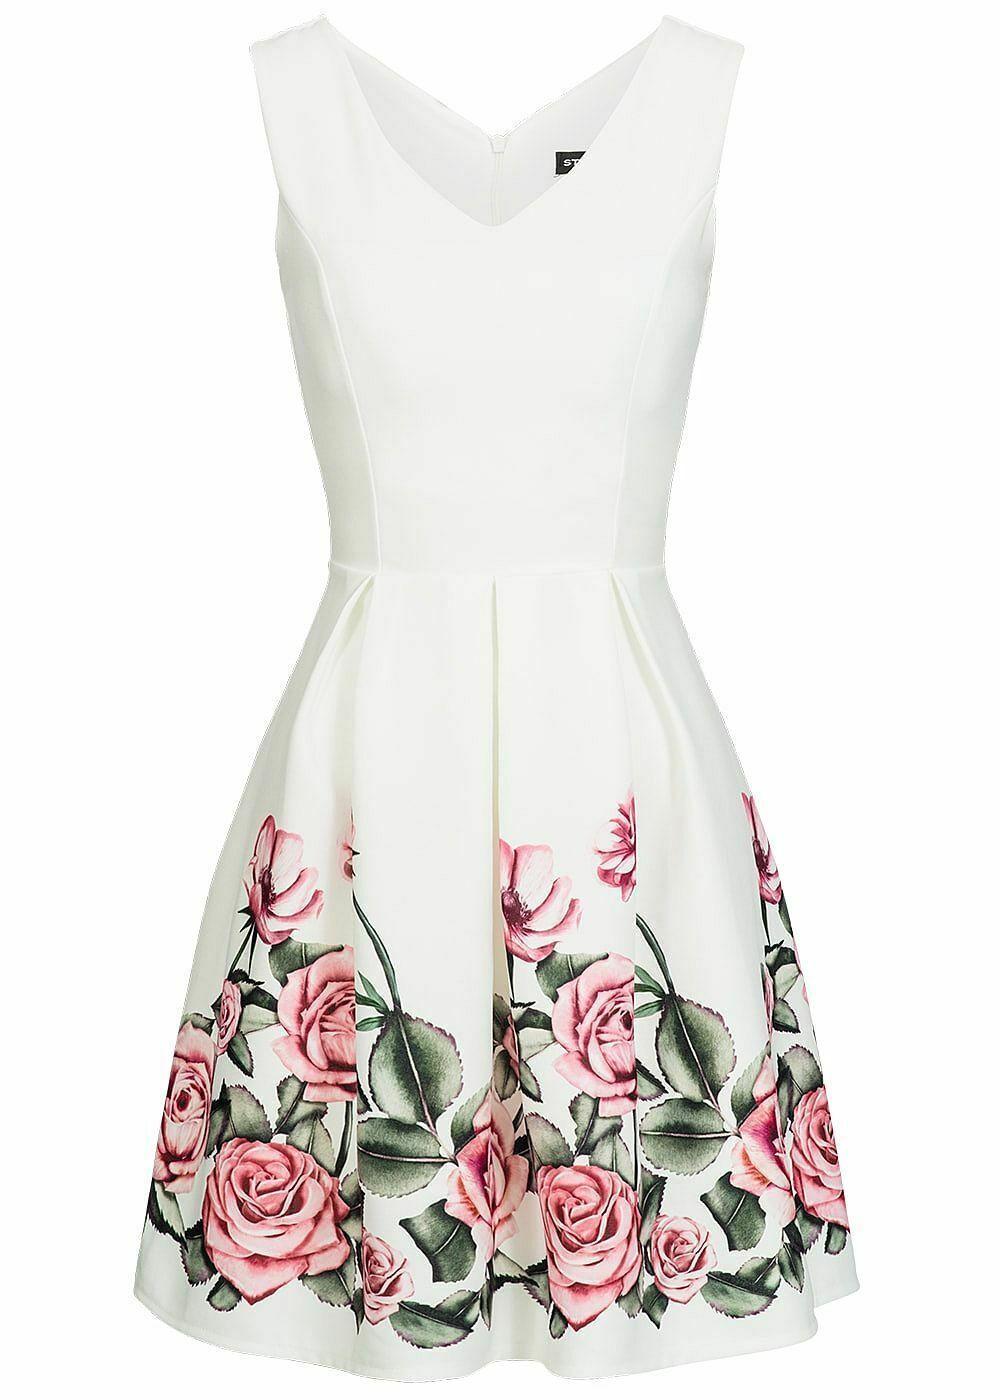 16% OFF B16 Damen Violet Kleid kurz geblümt mit Zipper